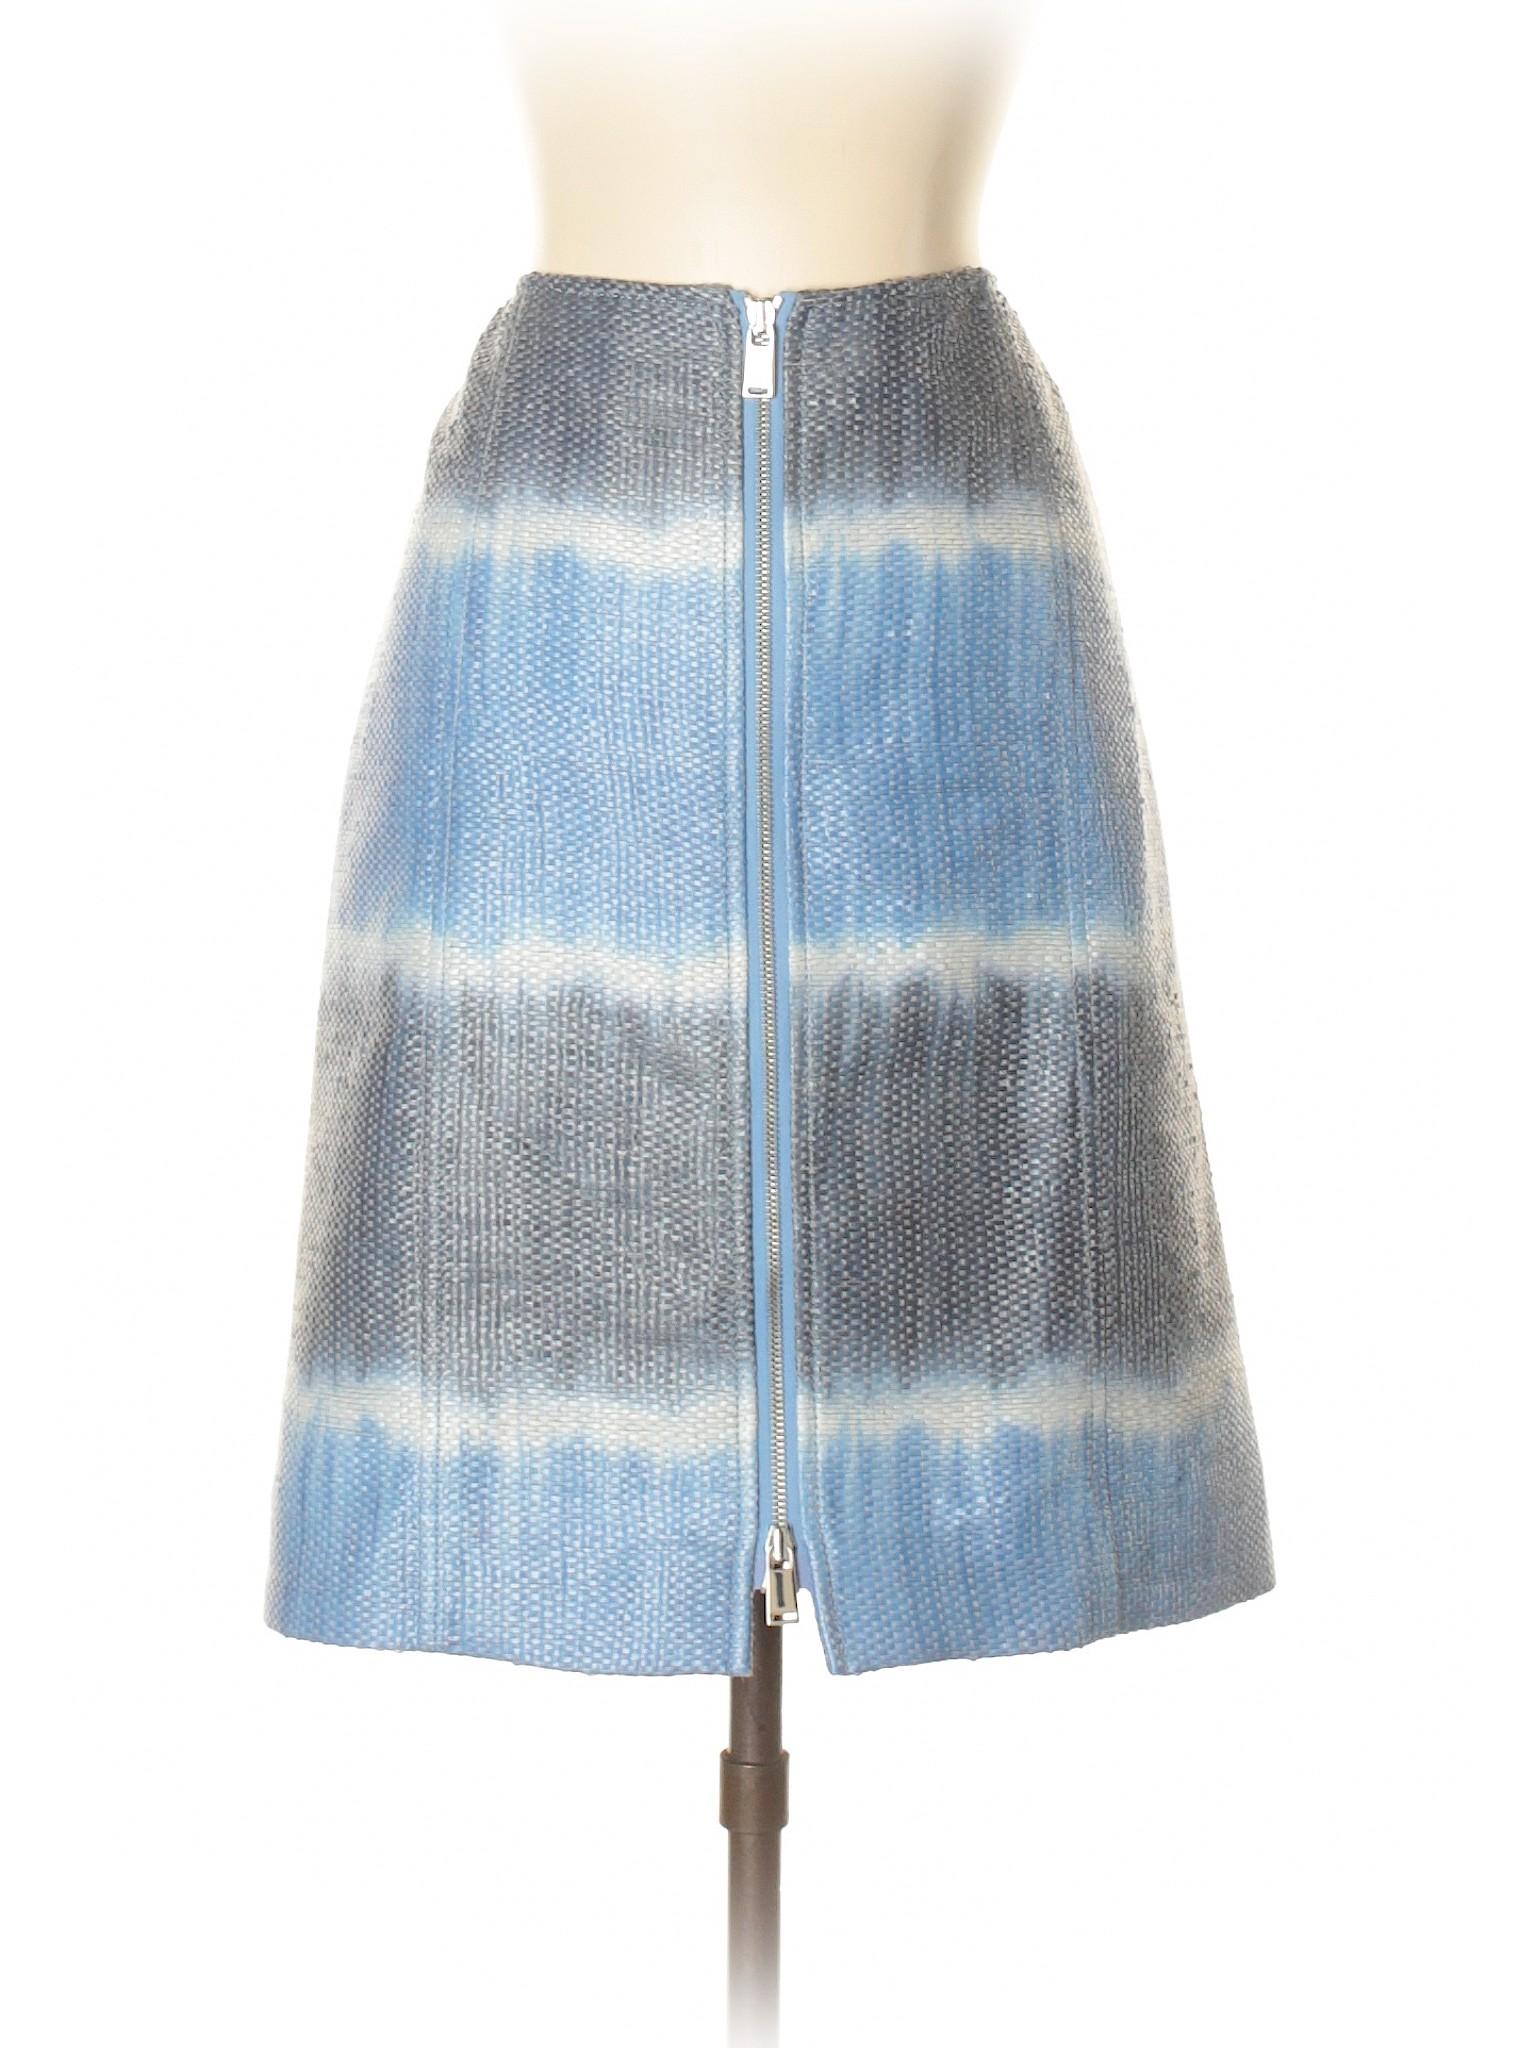 Skirt Boutique Skirt Skirt Boutique Casual Casual Casual Casual Boutique Skirt Boutique Boutique qBPaqw6